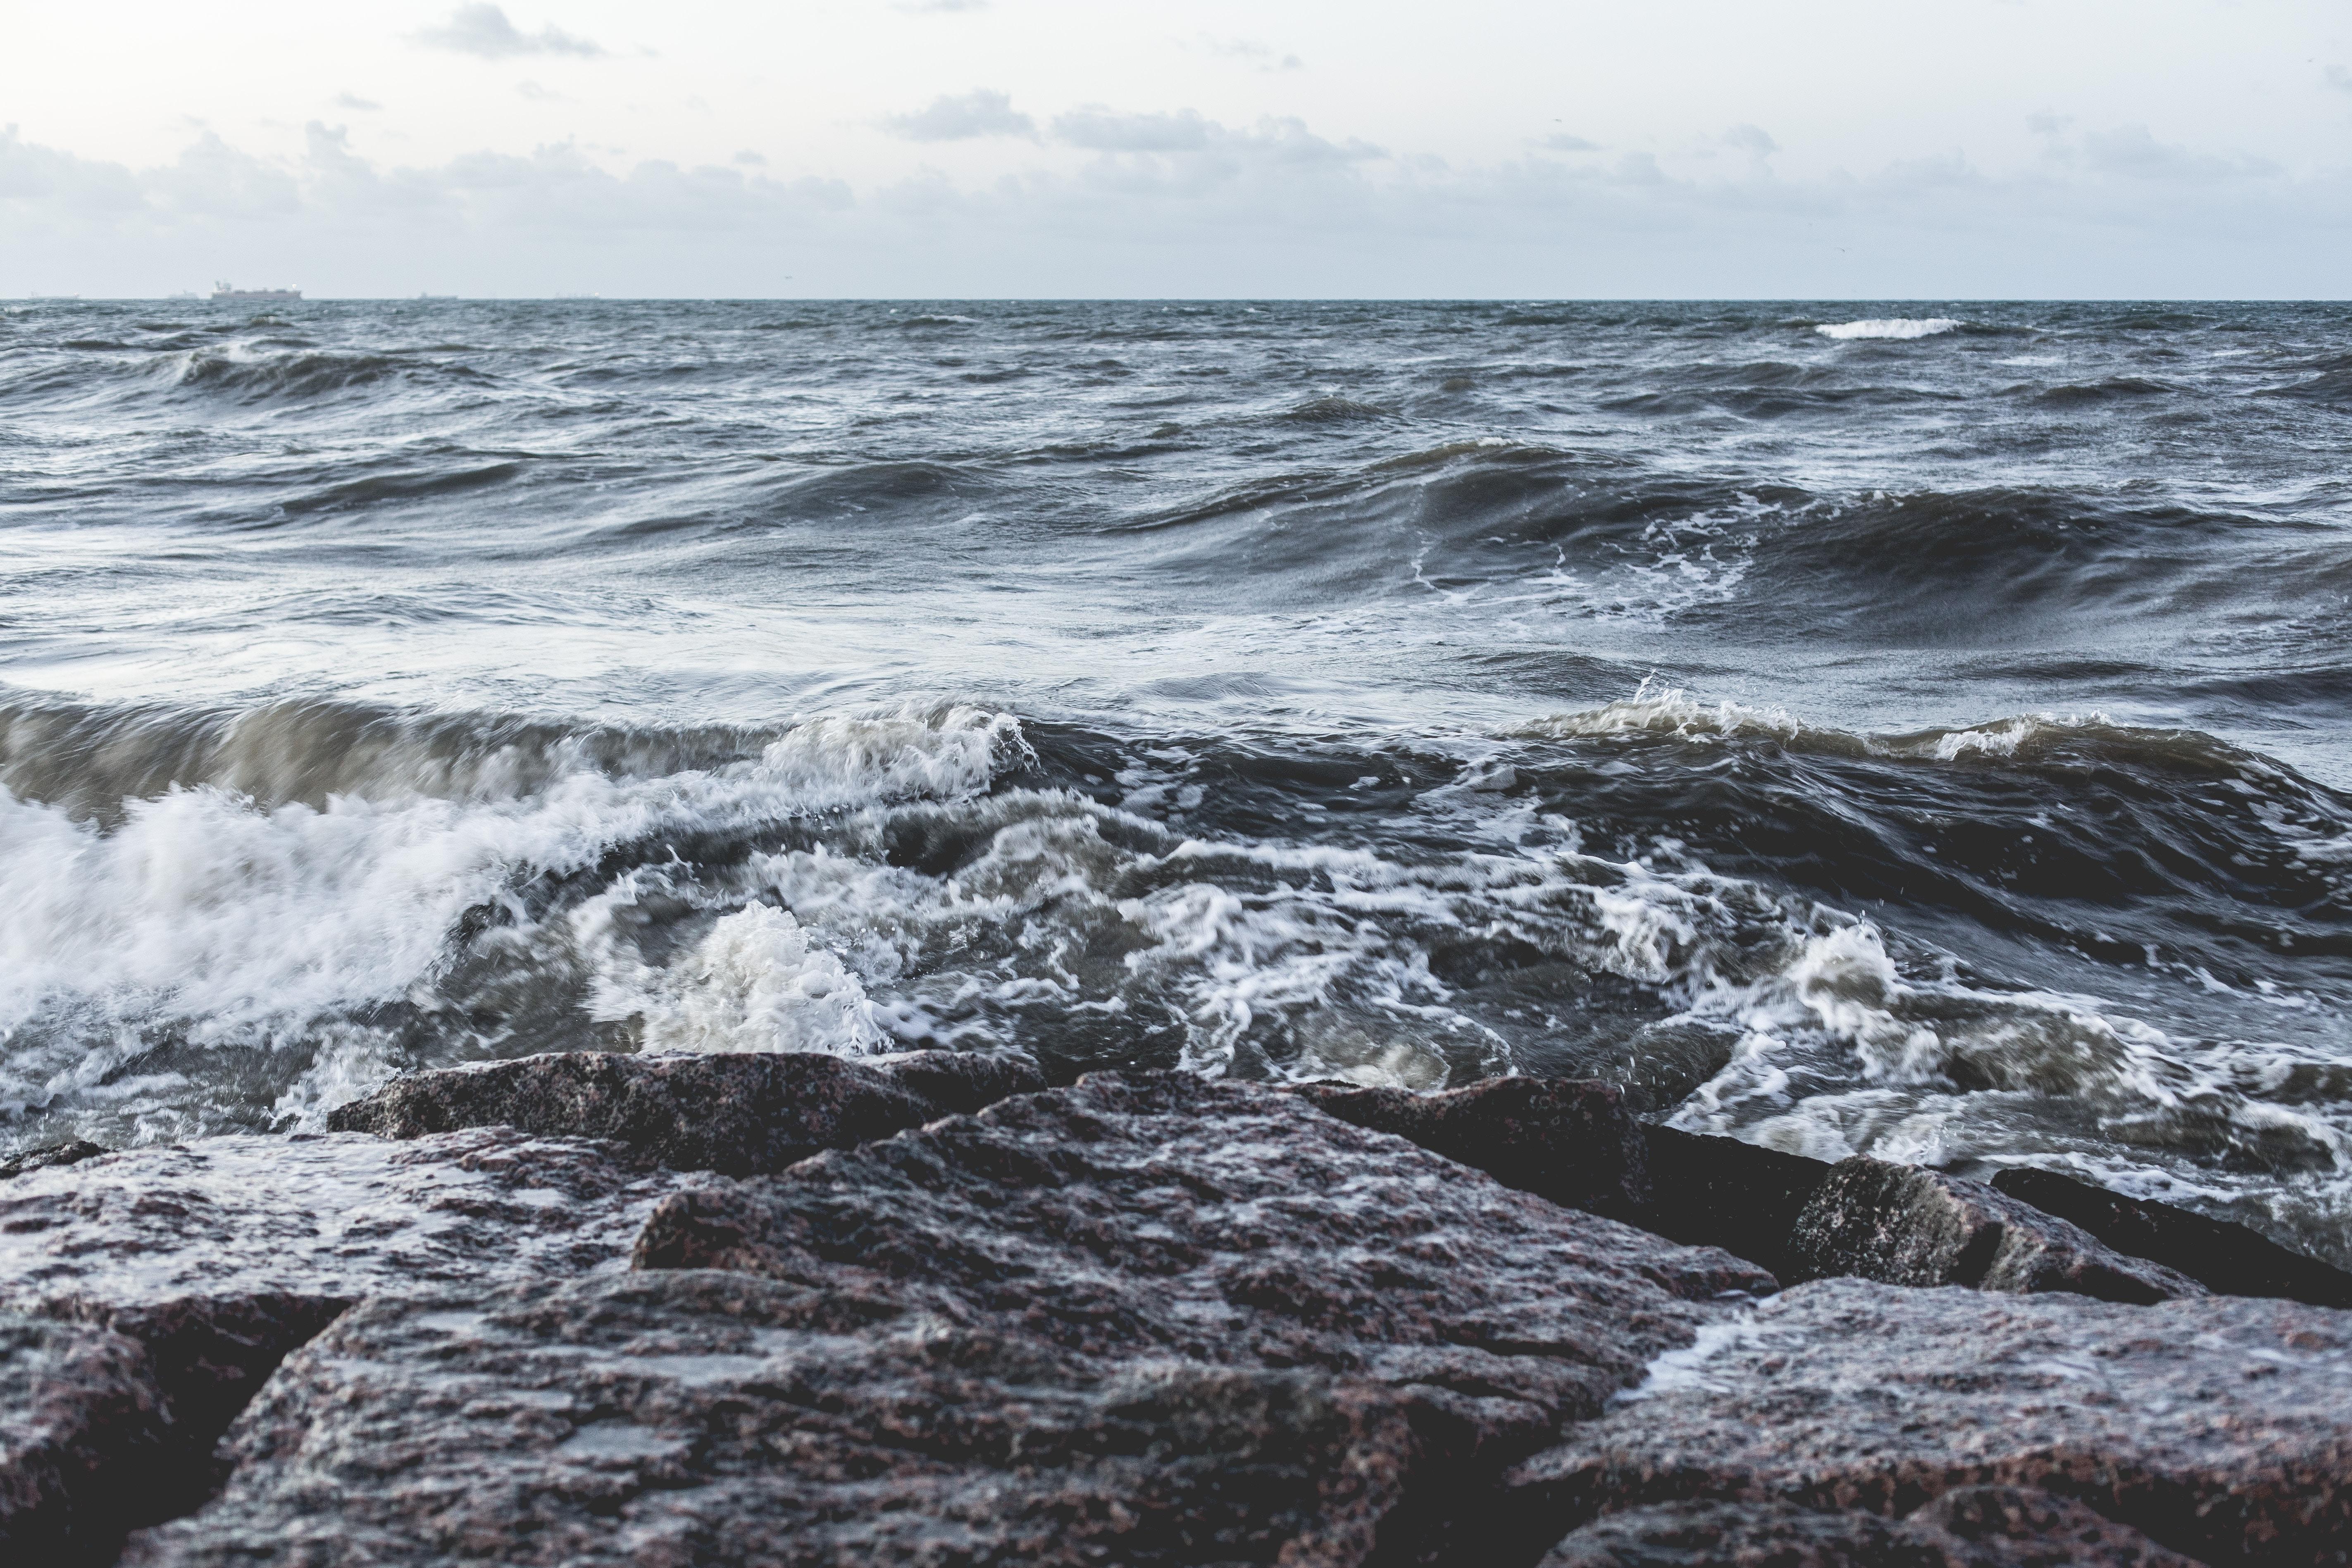 waves of ocean during daytime